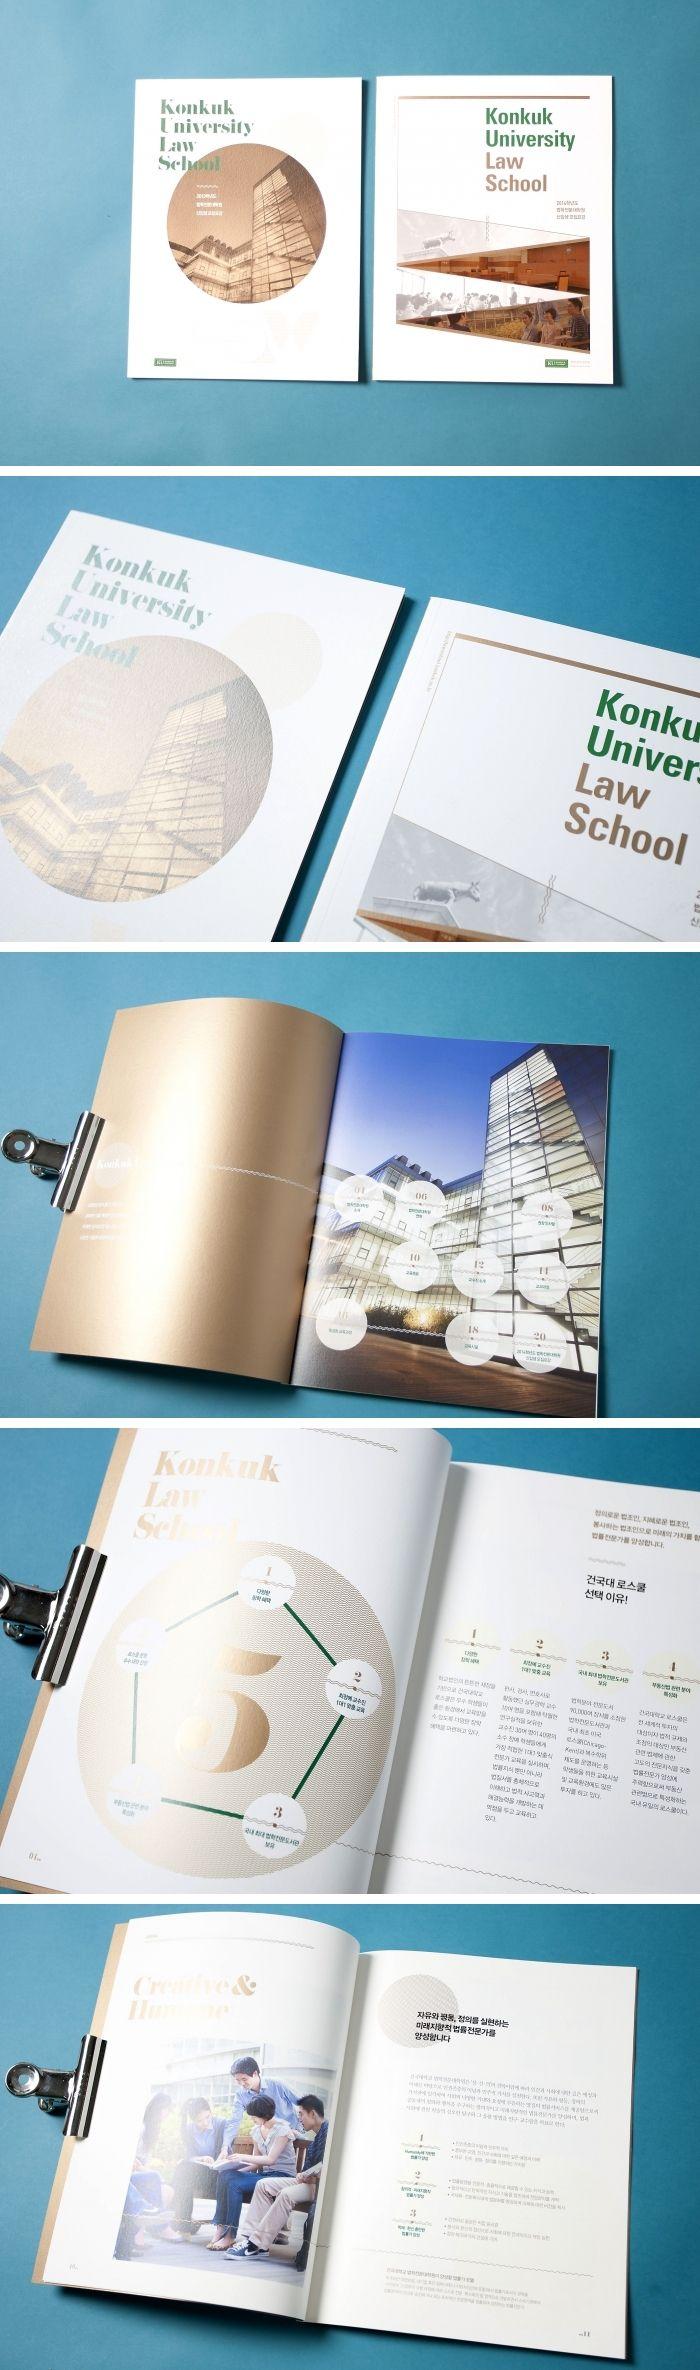 potential way to display pieces of design